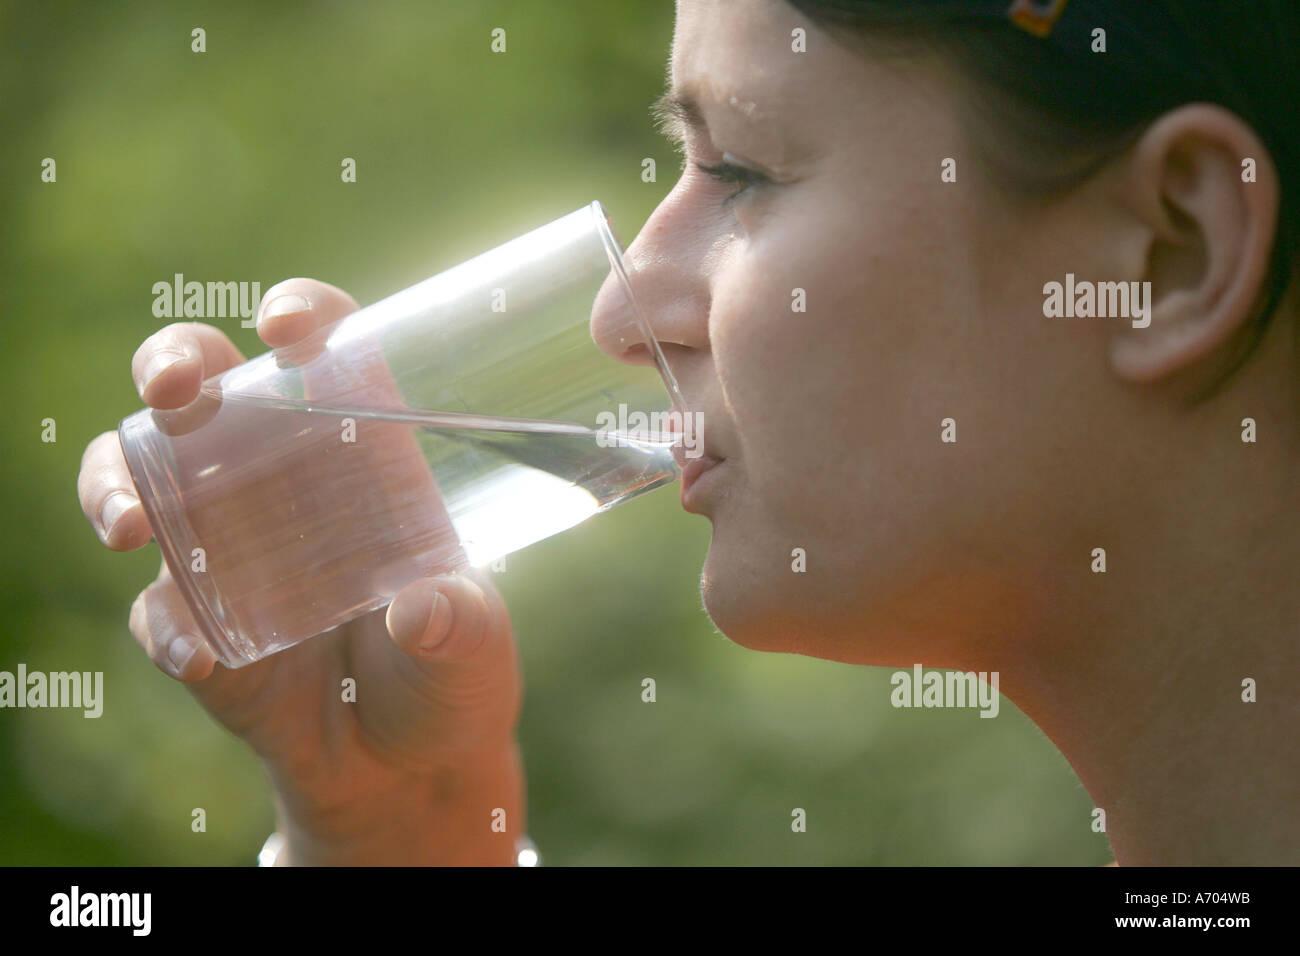 Heidelberg 28.06.2005, Vanessa drinks water - Stock Image